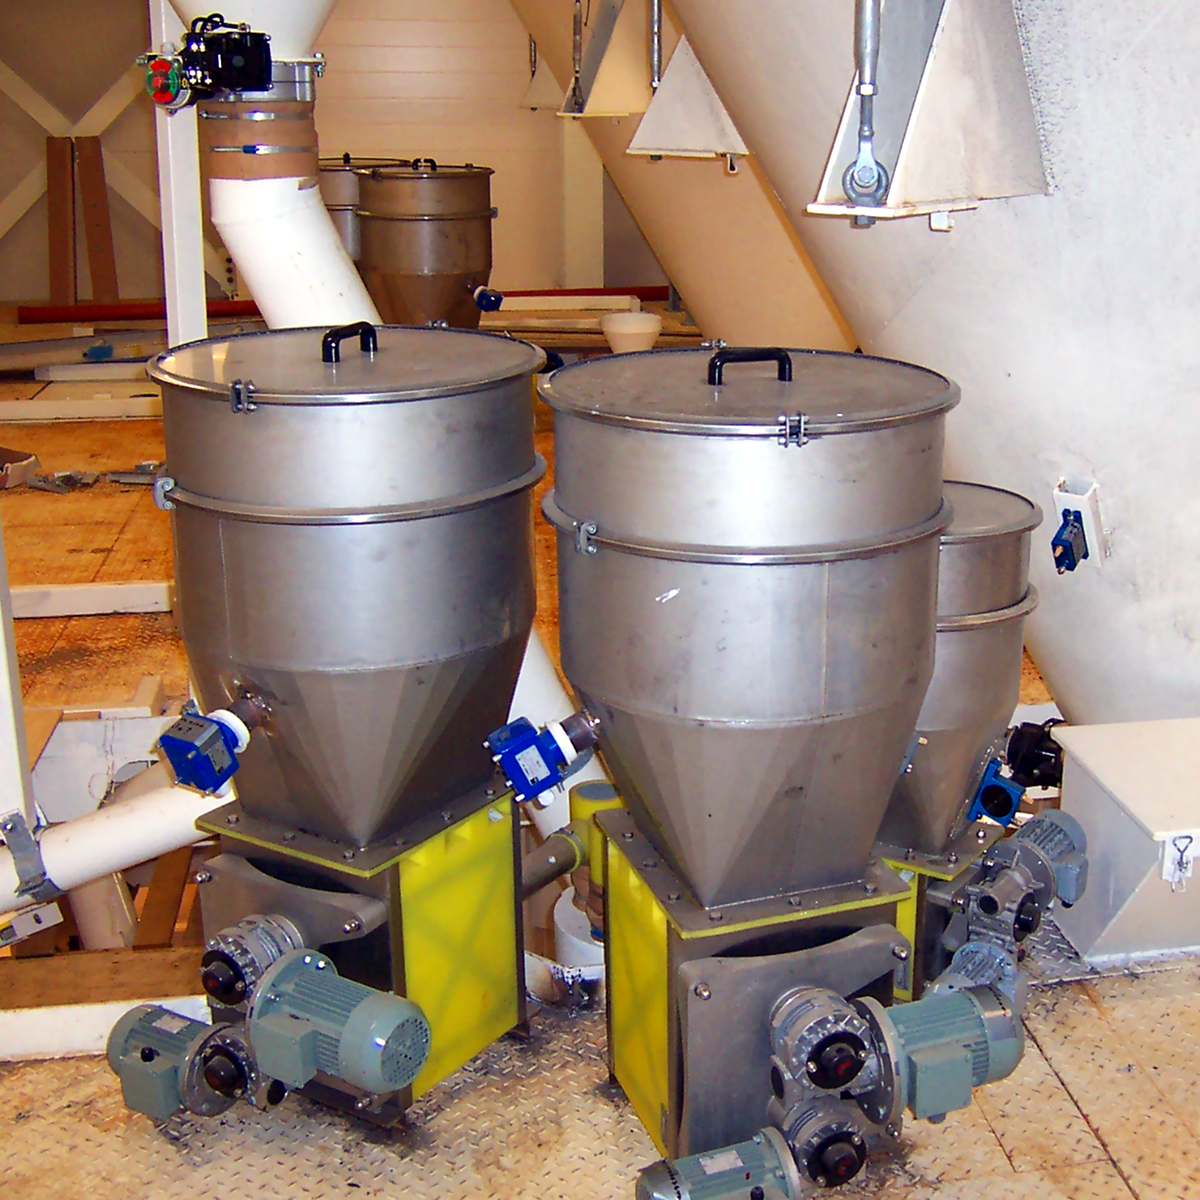 Mikrodoserare i torrbruksfabrik